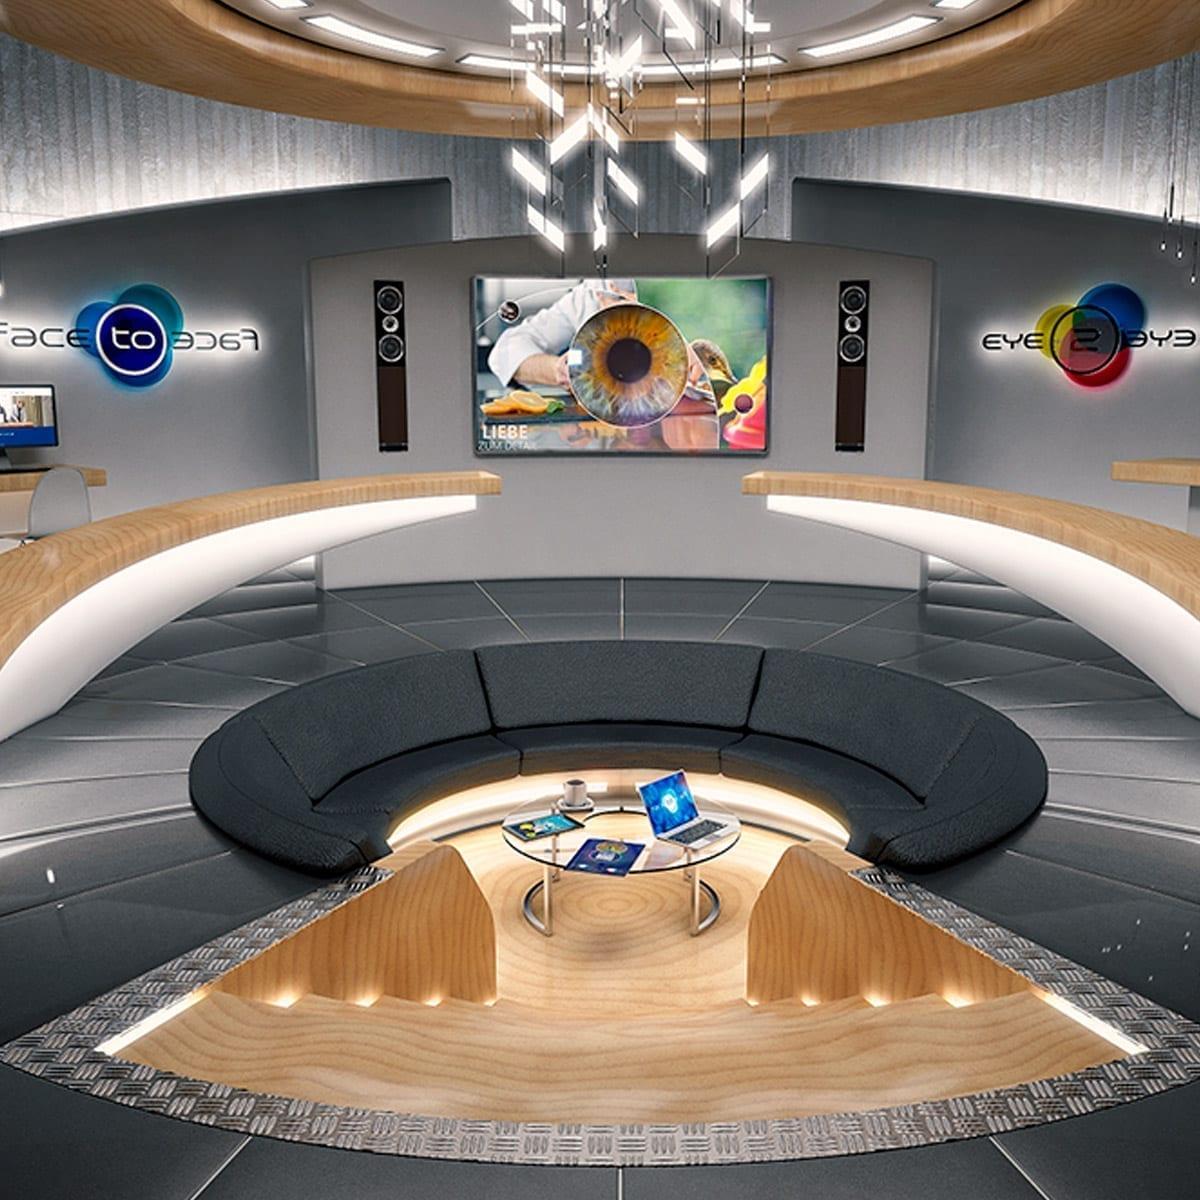 virtueller-showroom-eye2eye-kachel